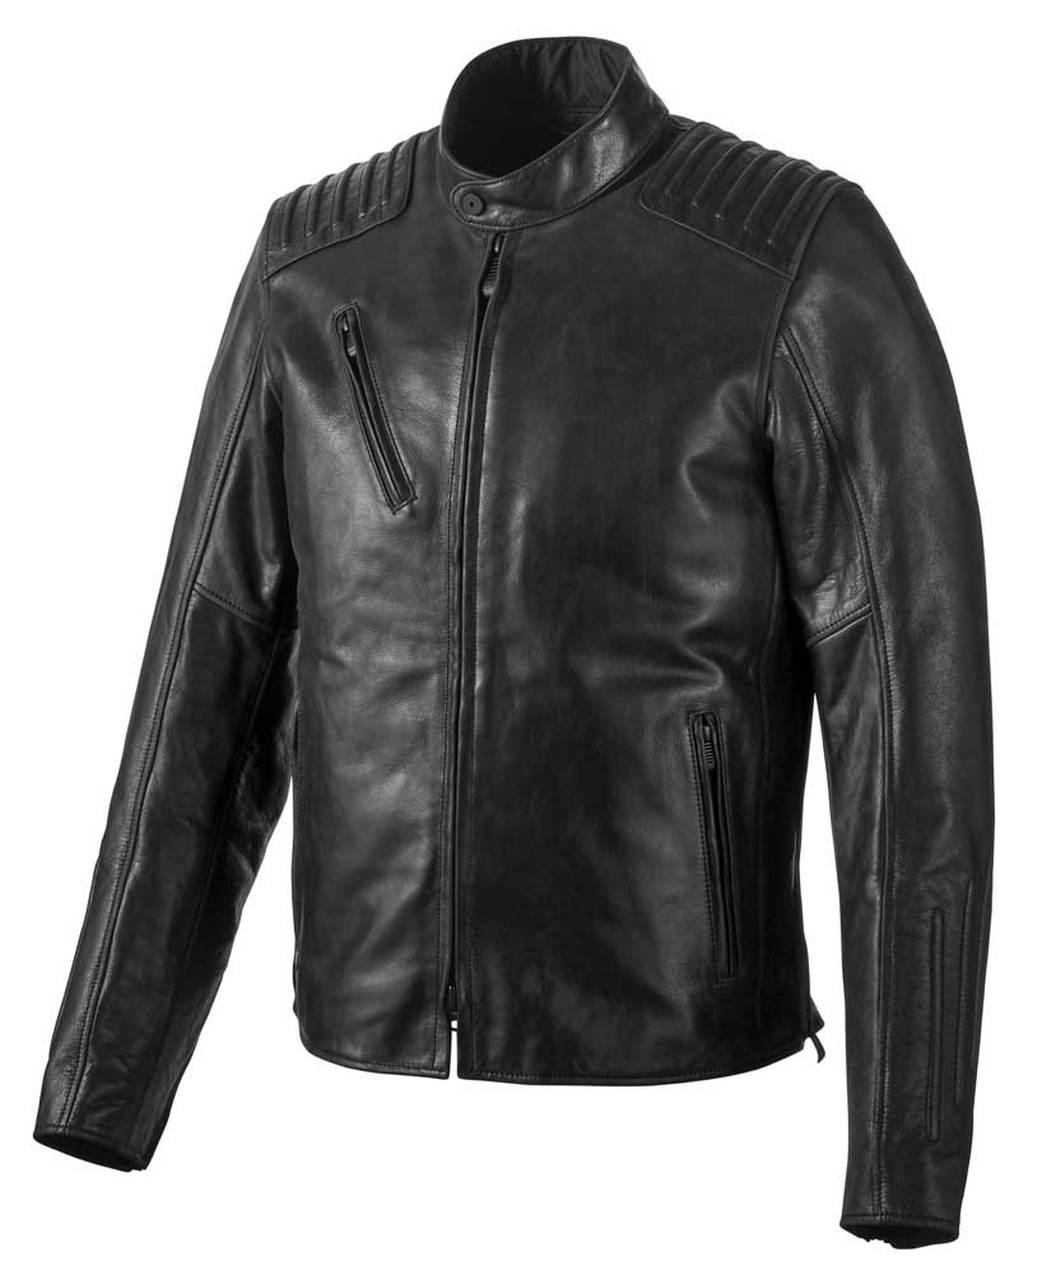 Harley-Davidson® Men's Temerity Slim Fit Leather Jacket, Black